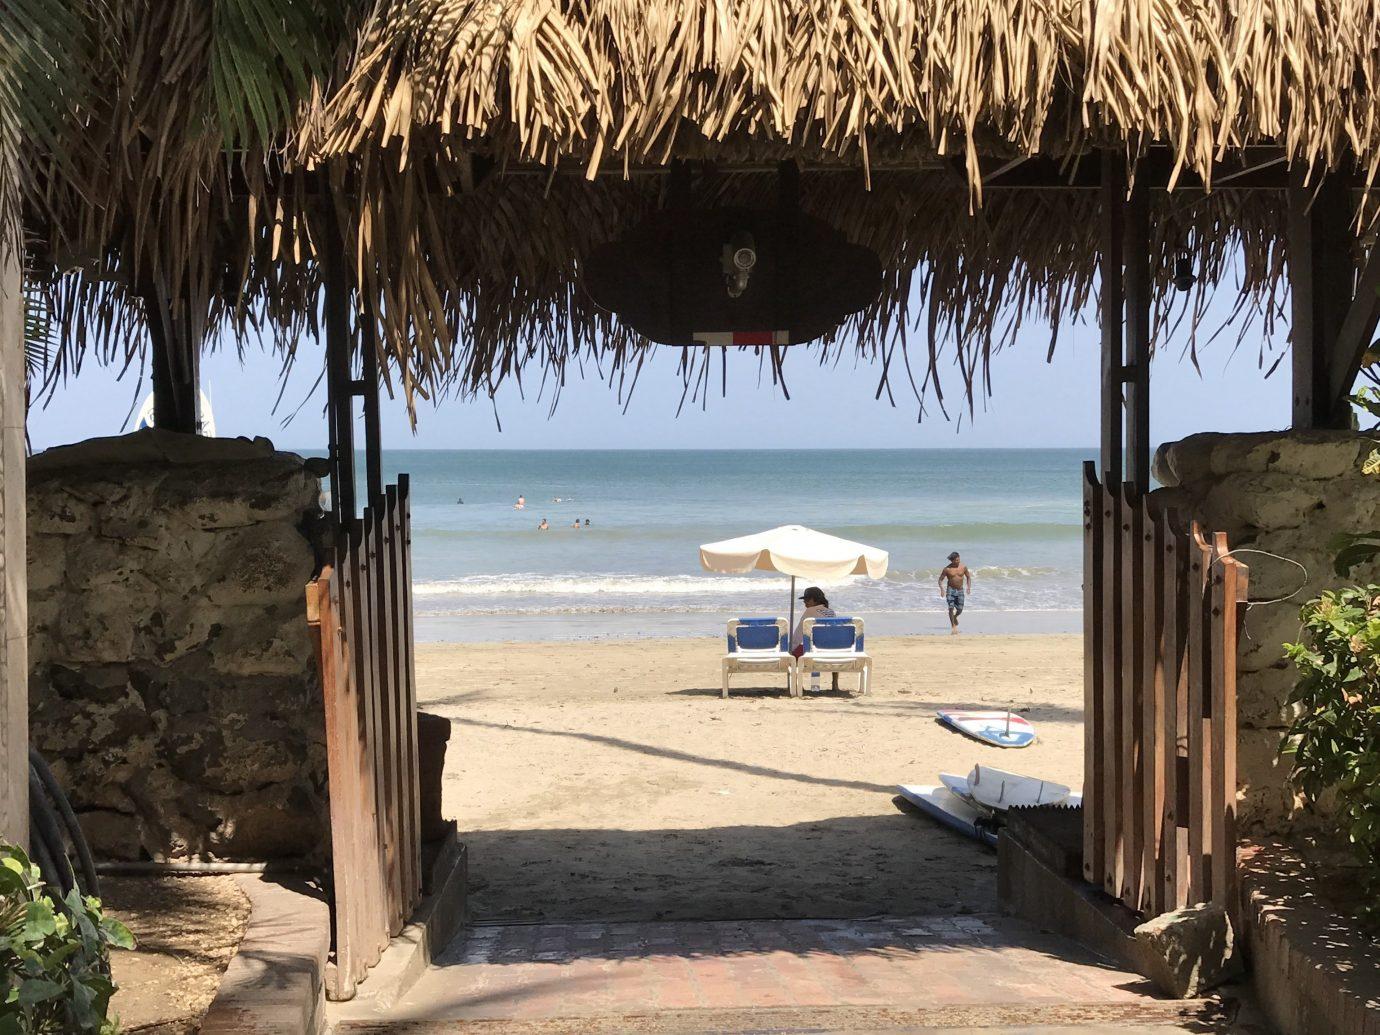 Health + Wellness Meditation Retreats Trip Ideas Yoga Retreats tree outdoor Beach ground water body of water plant palm Ocean Sea vacation sandy Coast bay shade shore day